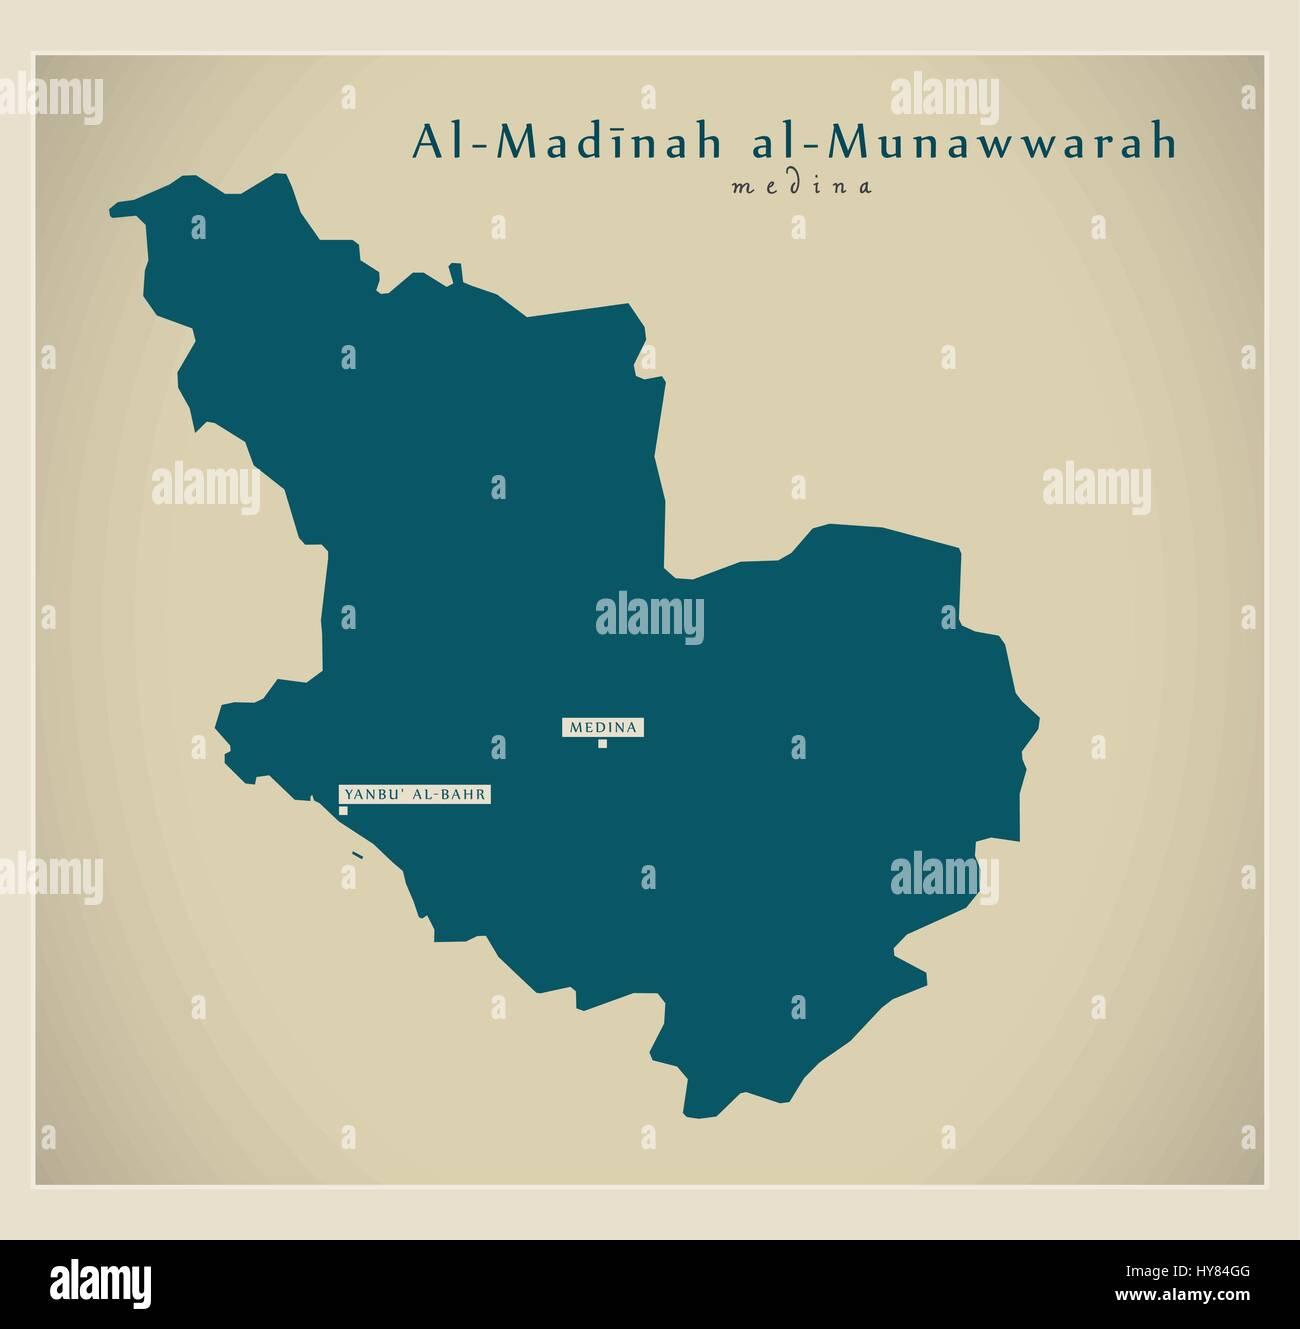 Modern Map - Al-Madinah al-Munawwarah SA - Stock Image